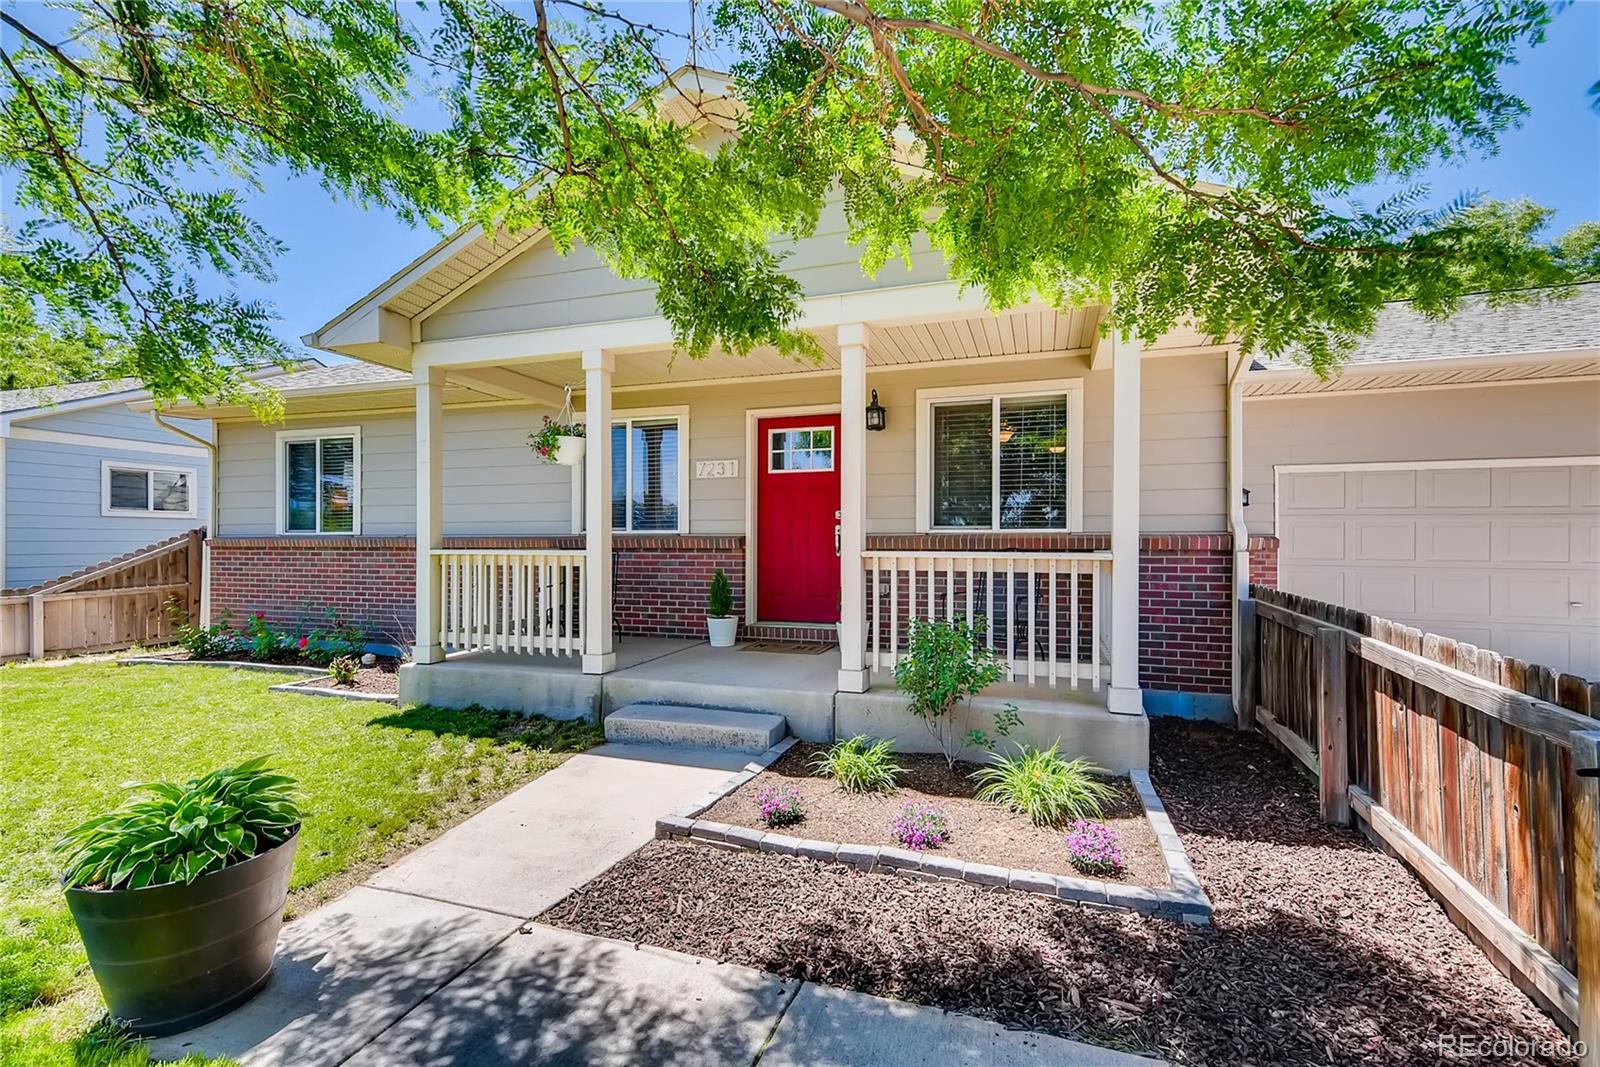 7231 Dahlia Street Property Photo - Commerce City, CO real estate listing